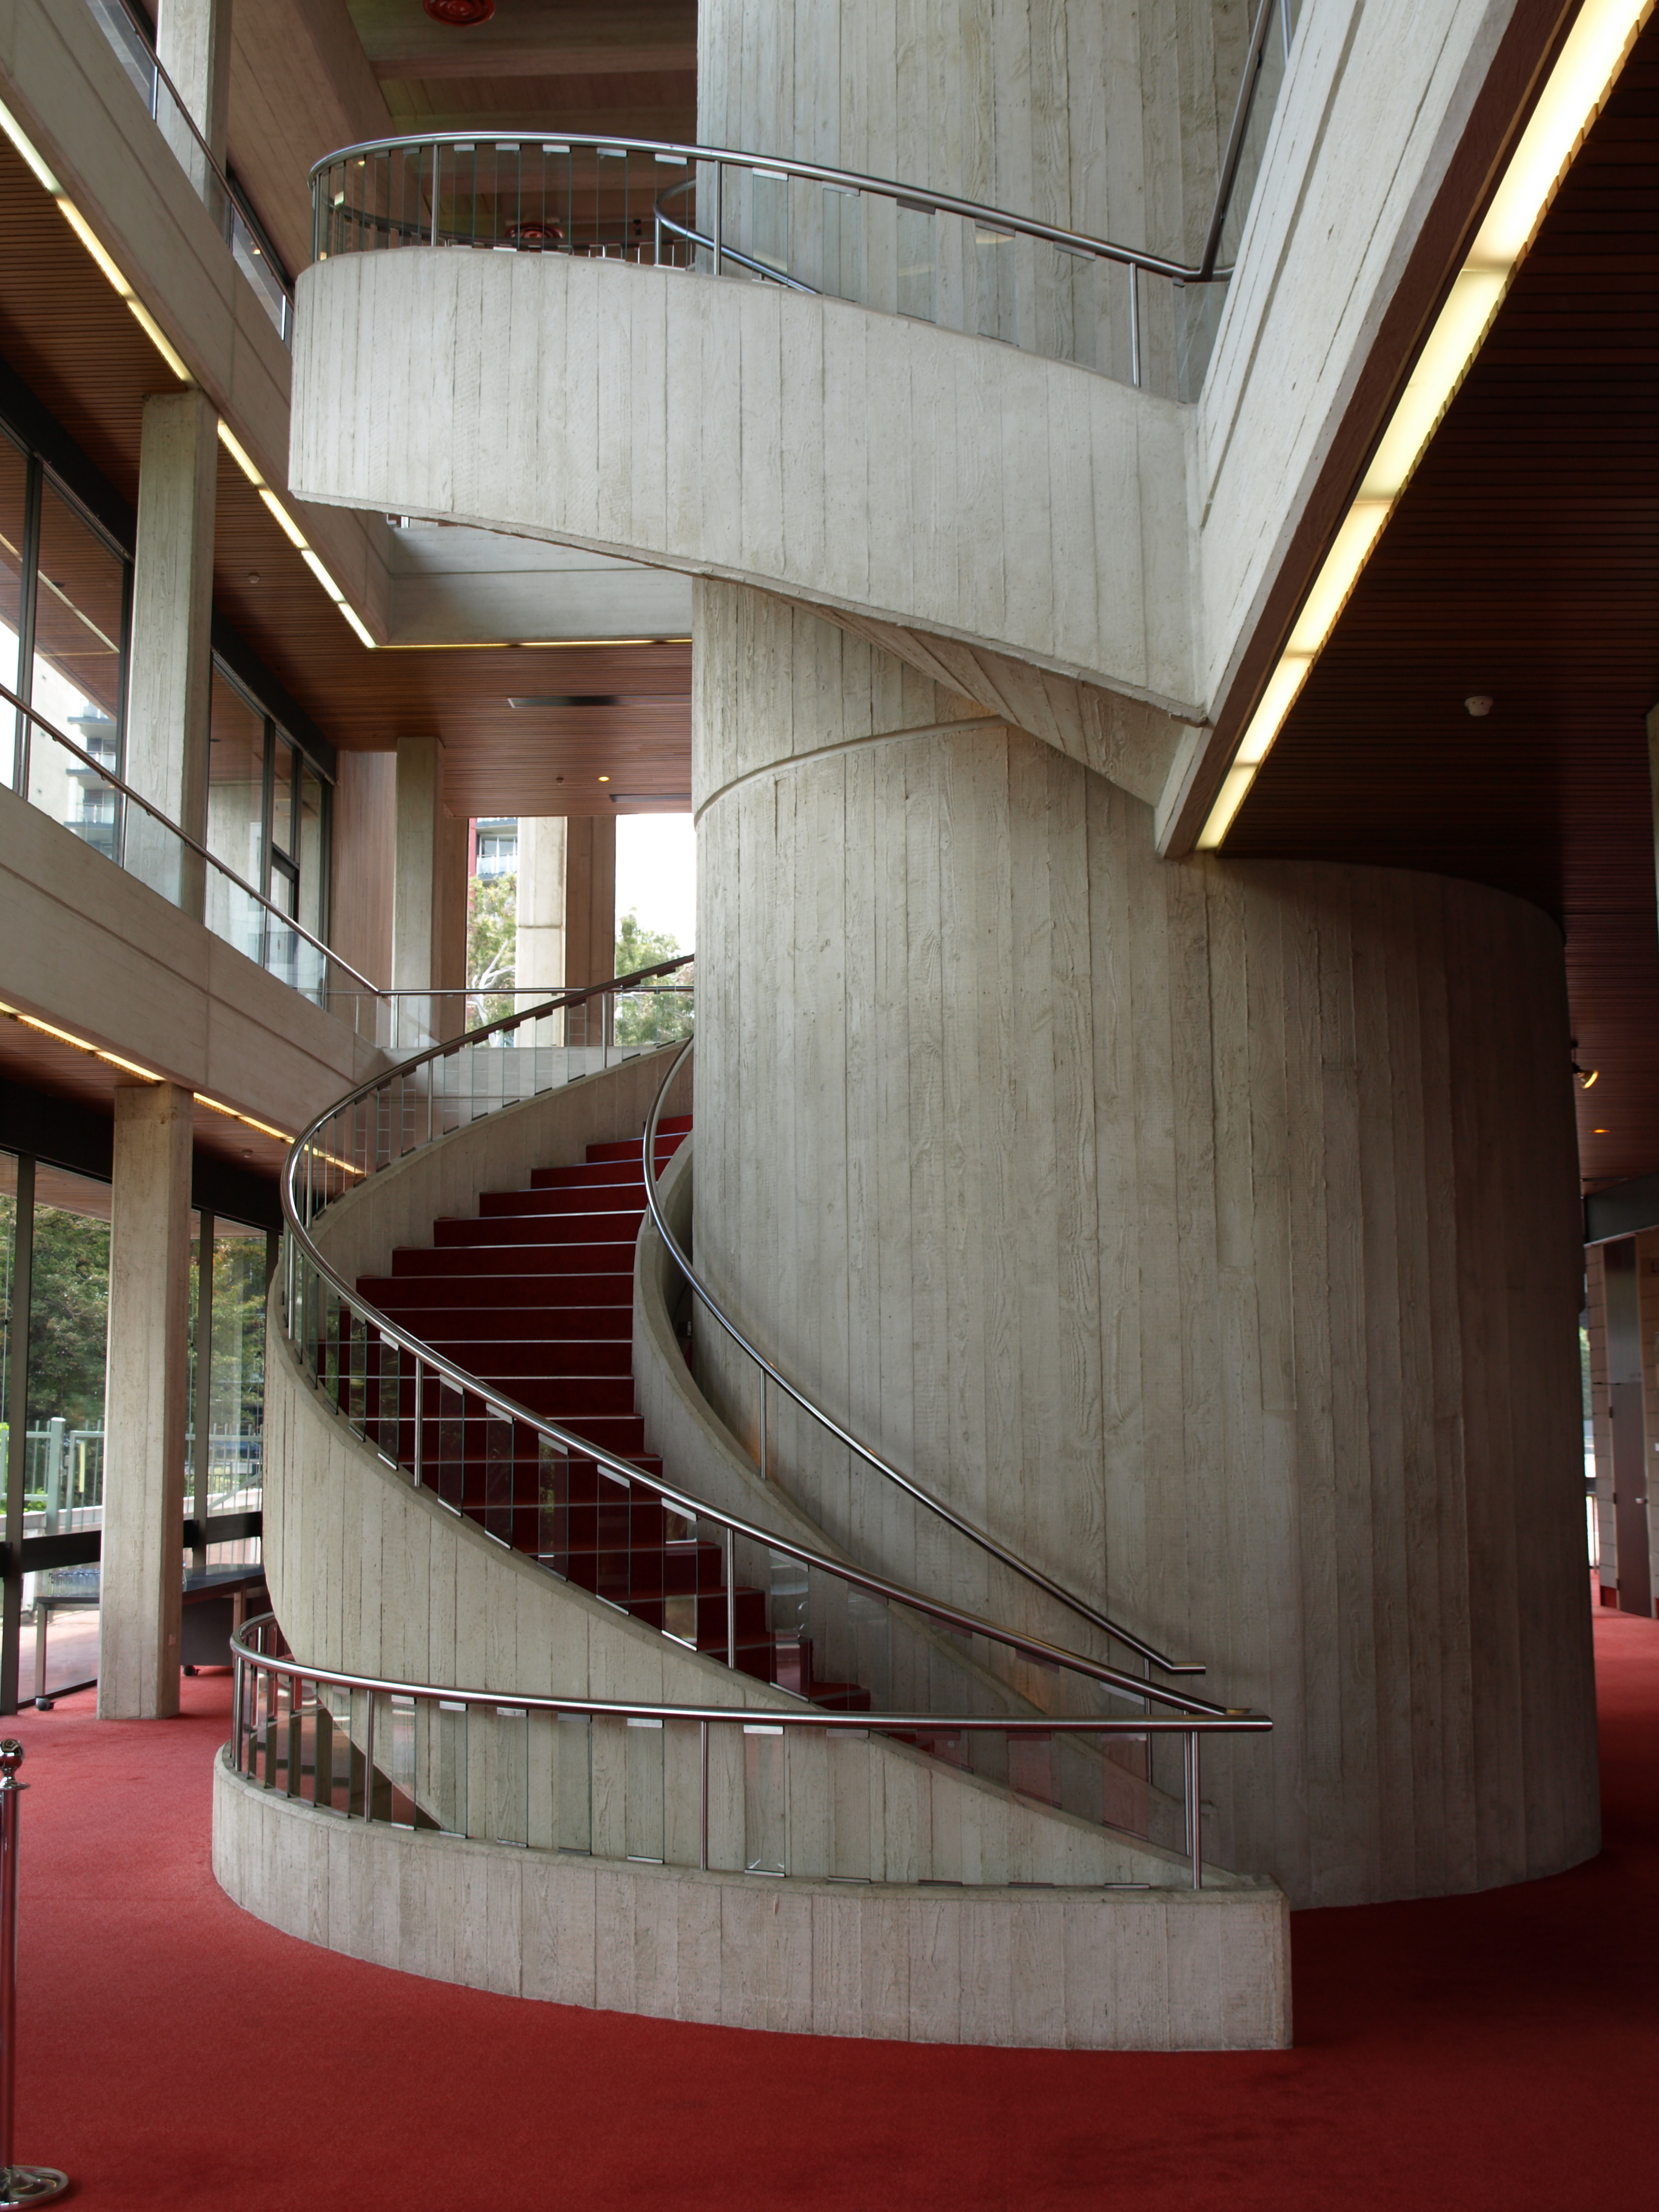 file perth concert hall interior detail wikimedia